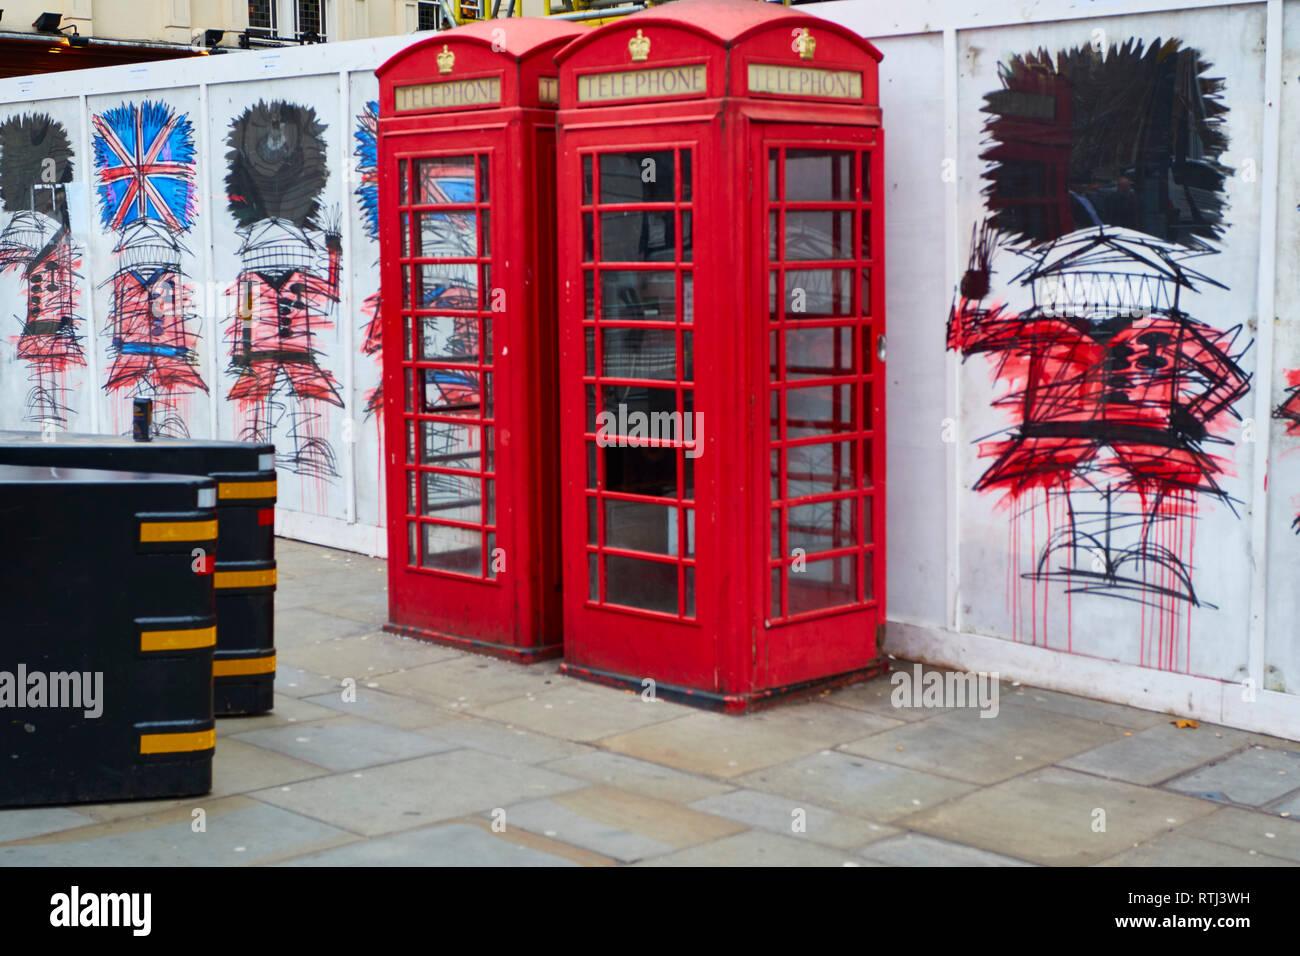 Red telephone boxes in swinging London, England, United Kingdom, Europe - Stock Image